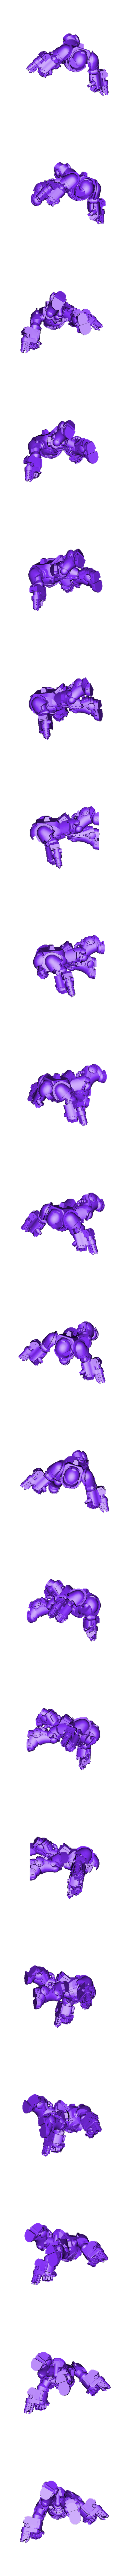 Aggressor_3_Body.stl Download free STL file Flame Armed Instigators • 3D printable template, danny_cyanide